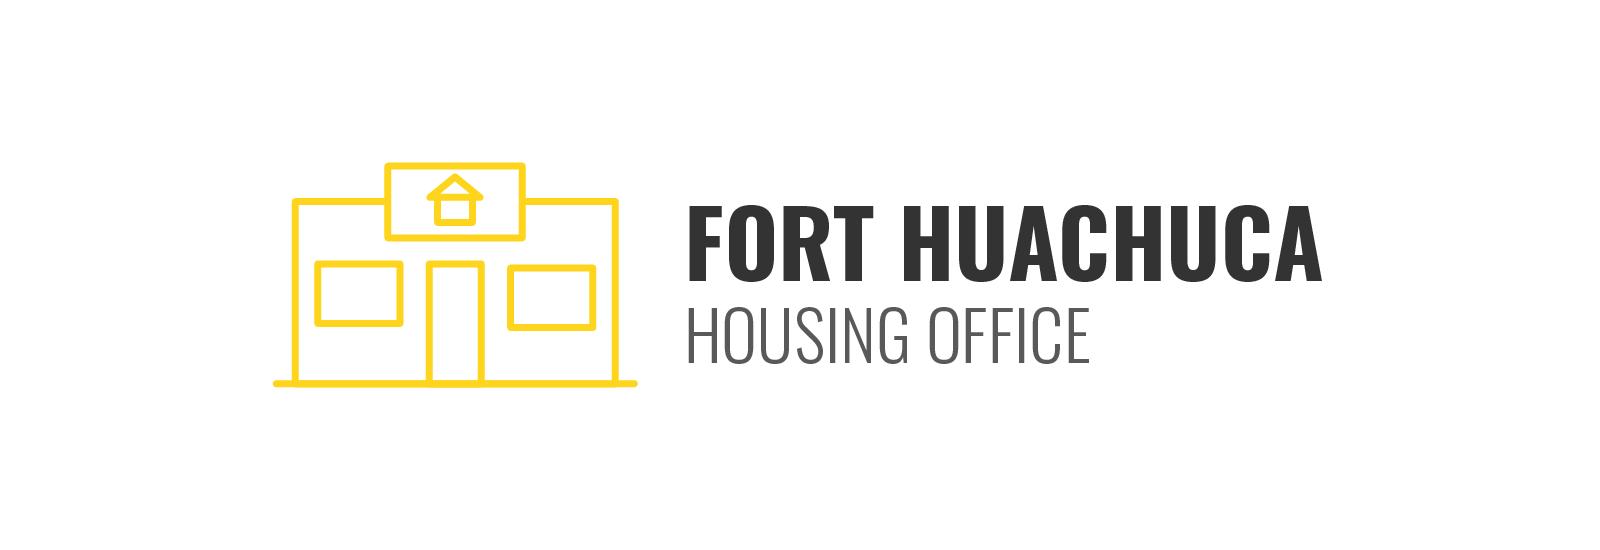 Fort Huachuca Housing Office